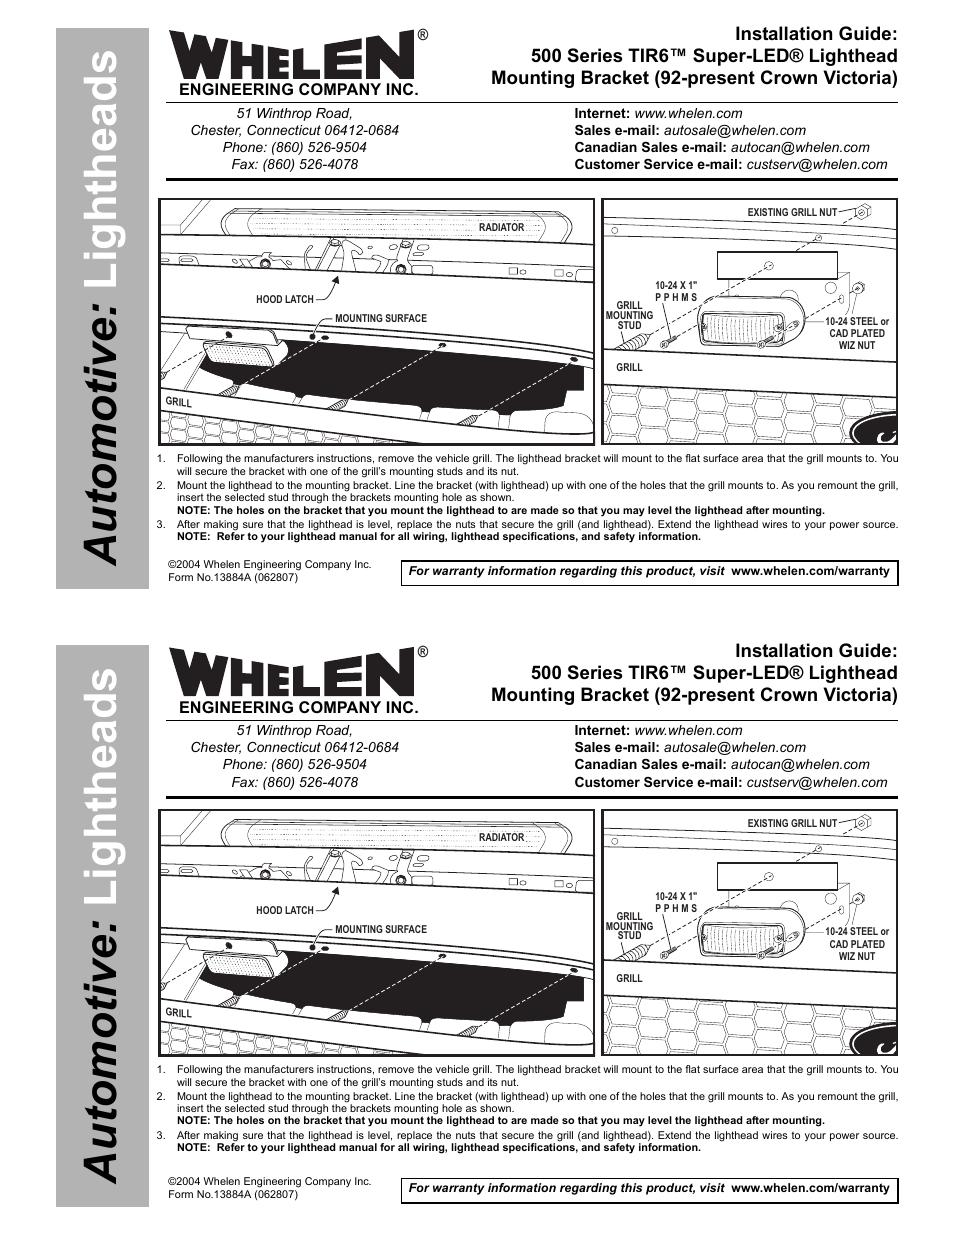 Whelen 500 Series Tir6 Wiring Diagram 700 Led 5bkt1 User Manual 1 Page On Blue